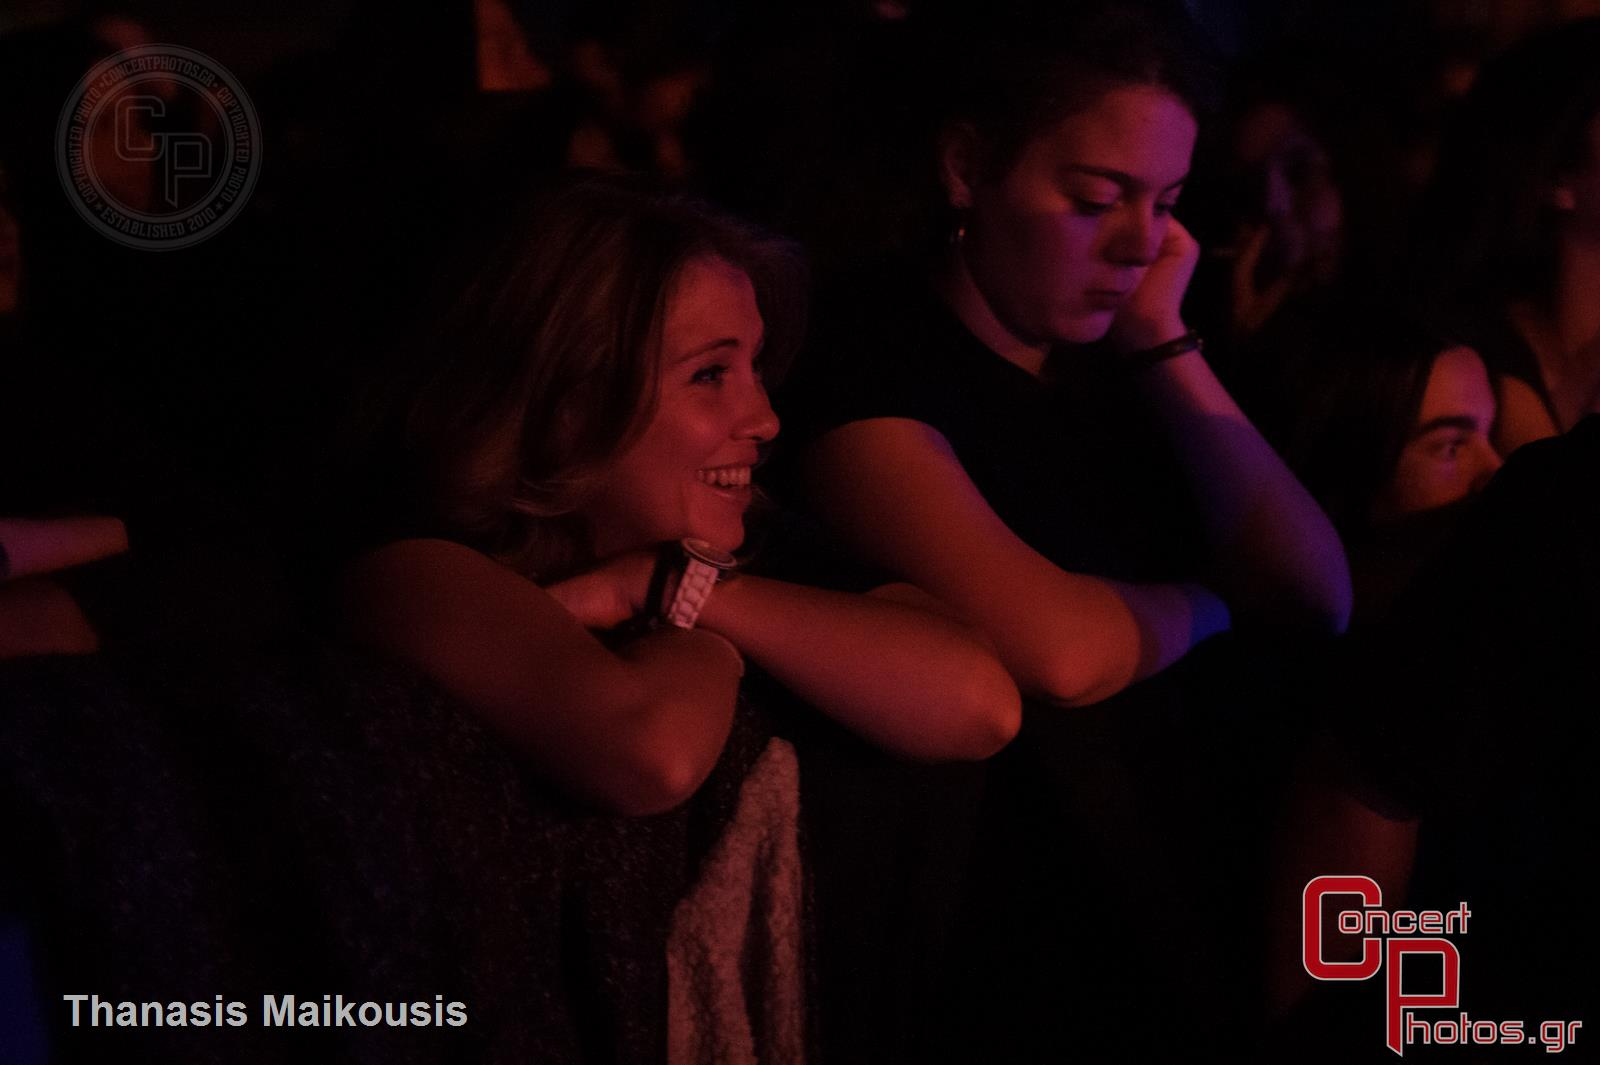 Villagers Of Ioannina City (V.I.C.) & Smallman-Villagers Of Ioannina City (V.I.C.) Smallman photographer: Thanasis Maikousis - concertphotos_20141115_22_49_08